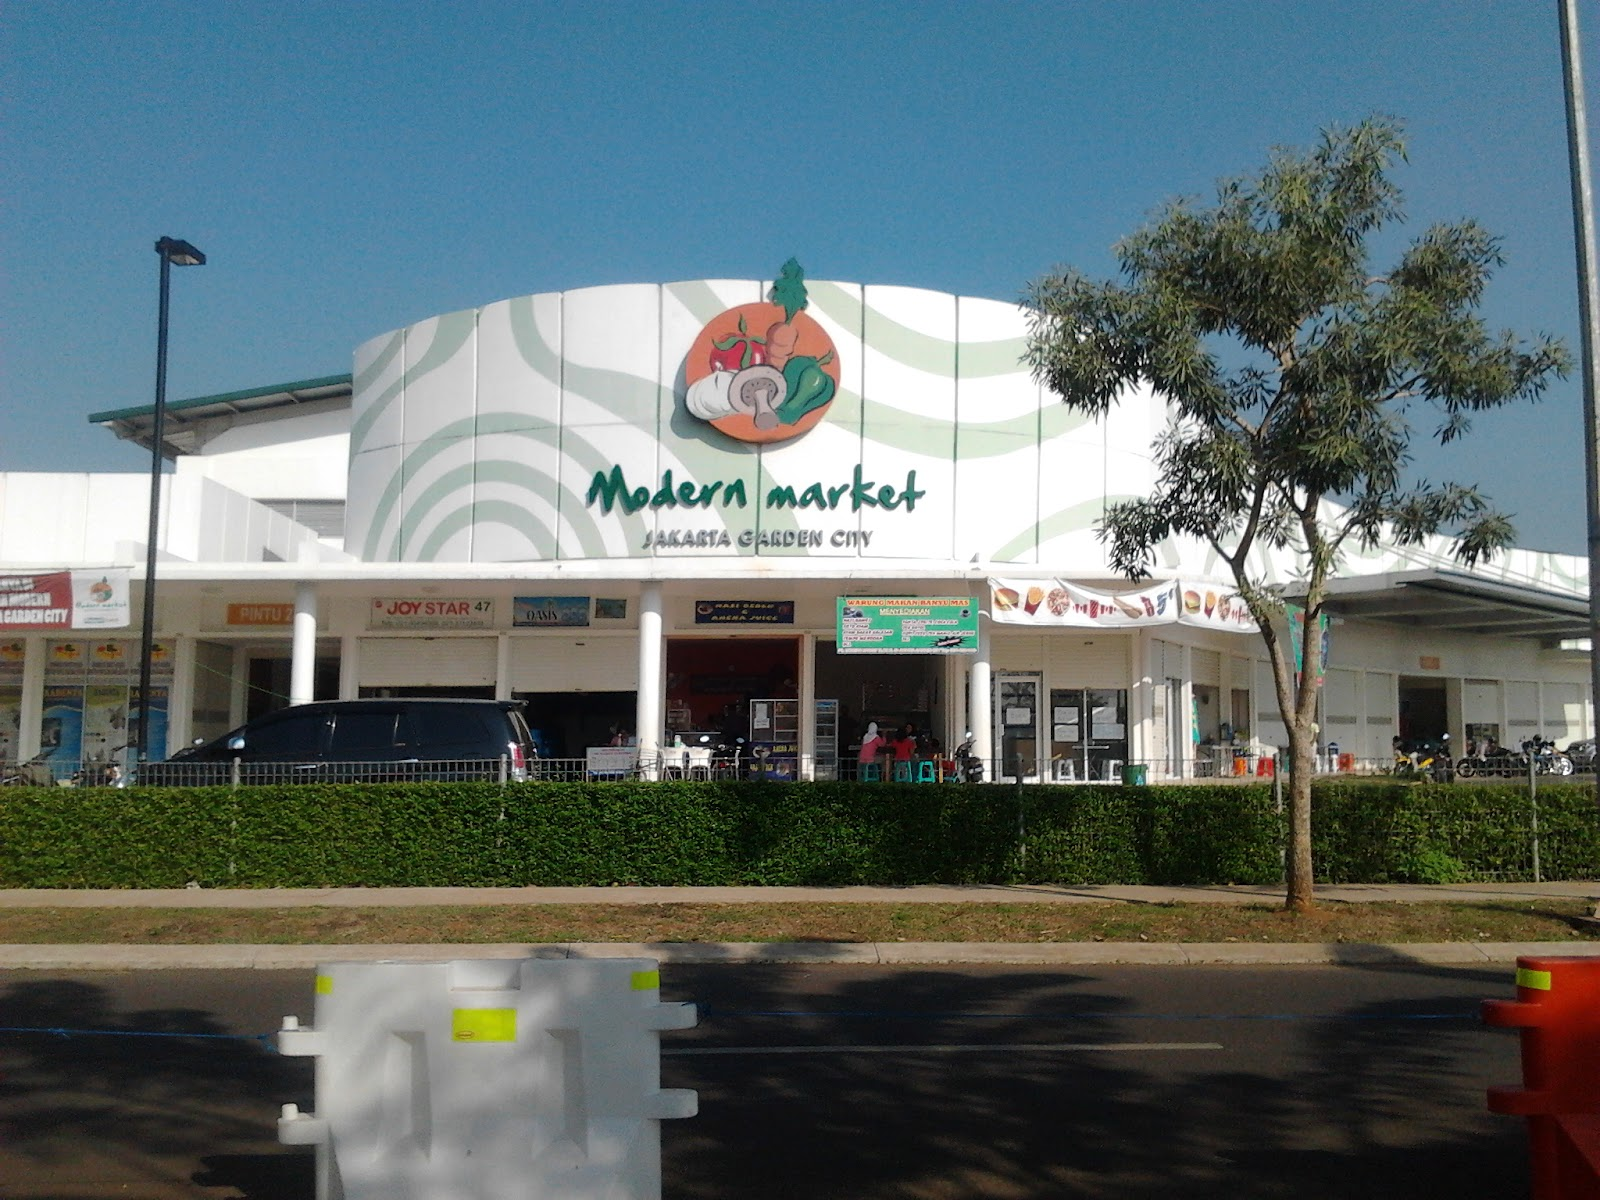 Blog Mang Nana Pasar Modern Aman Nyaman Bersih Dan Murah Di Jakarta Garden City